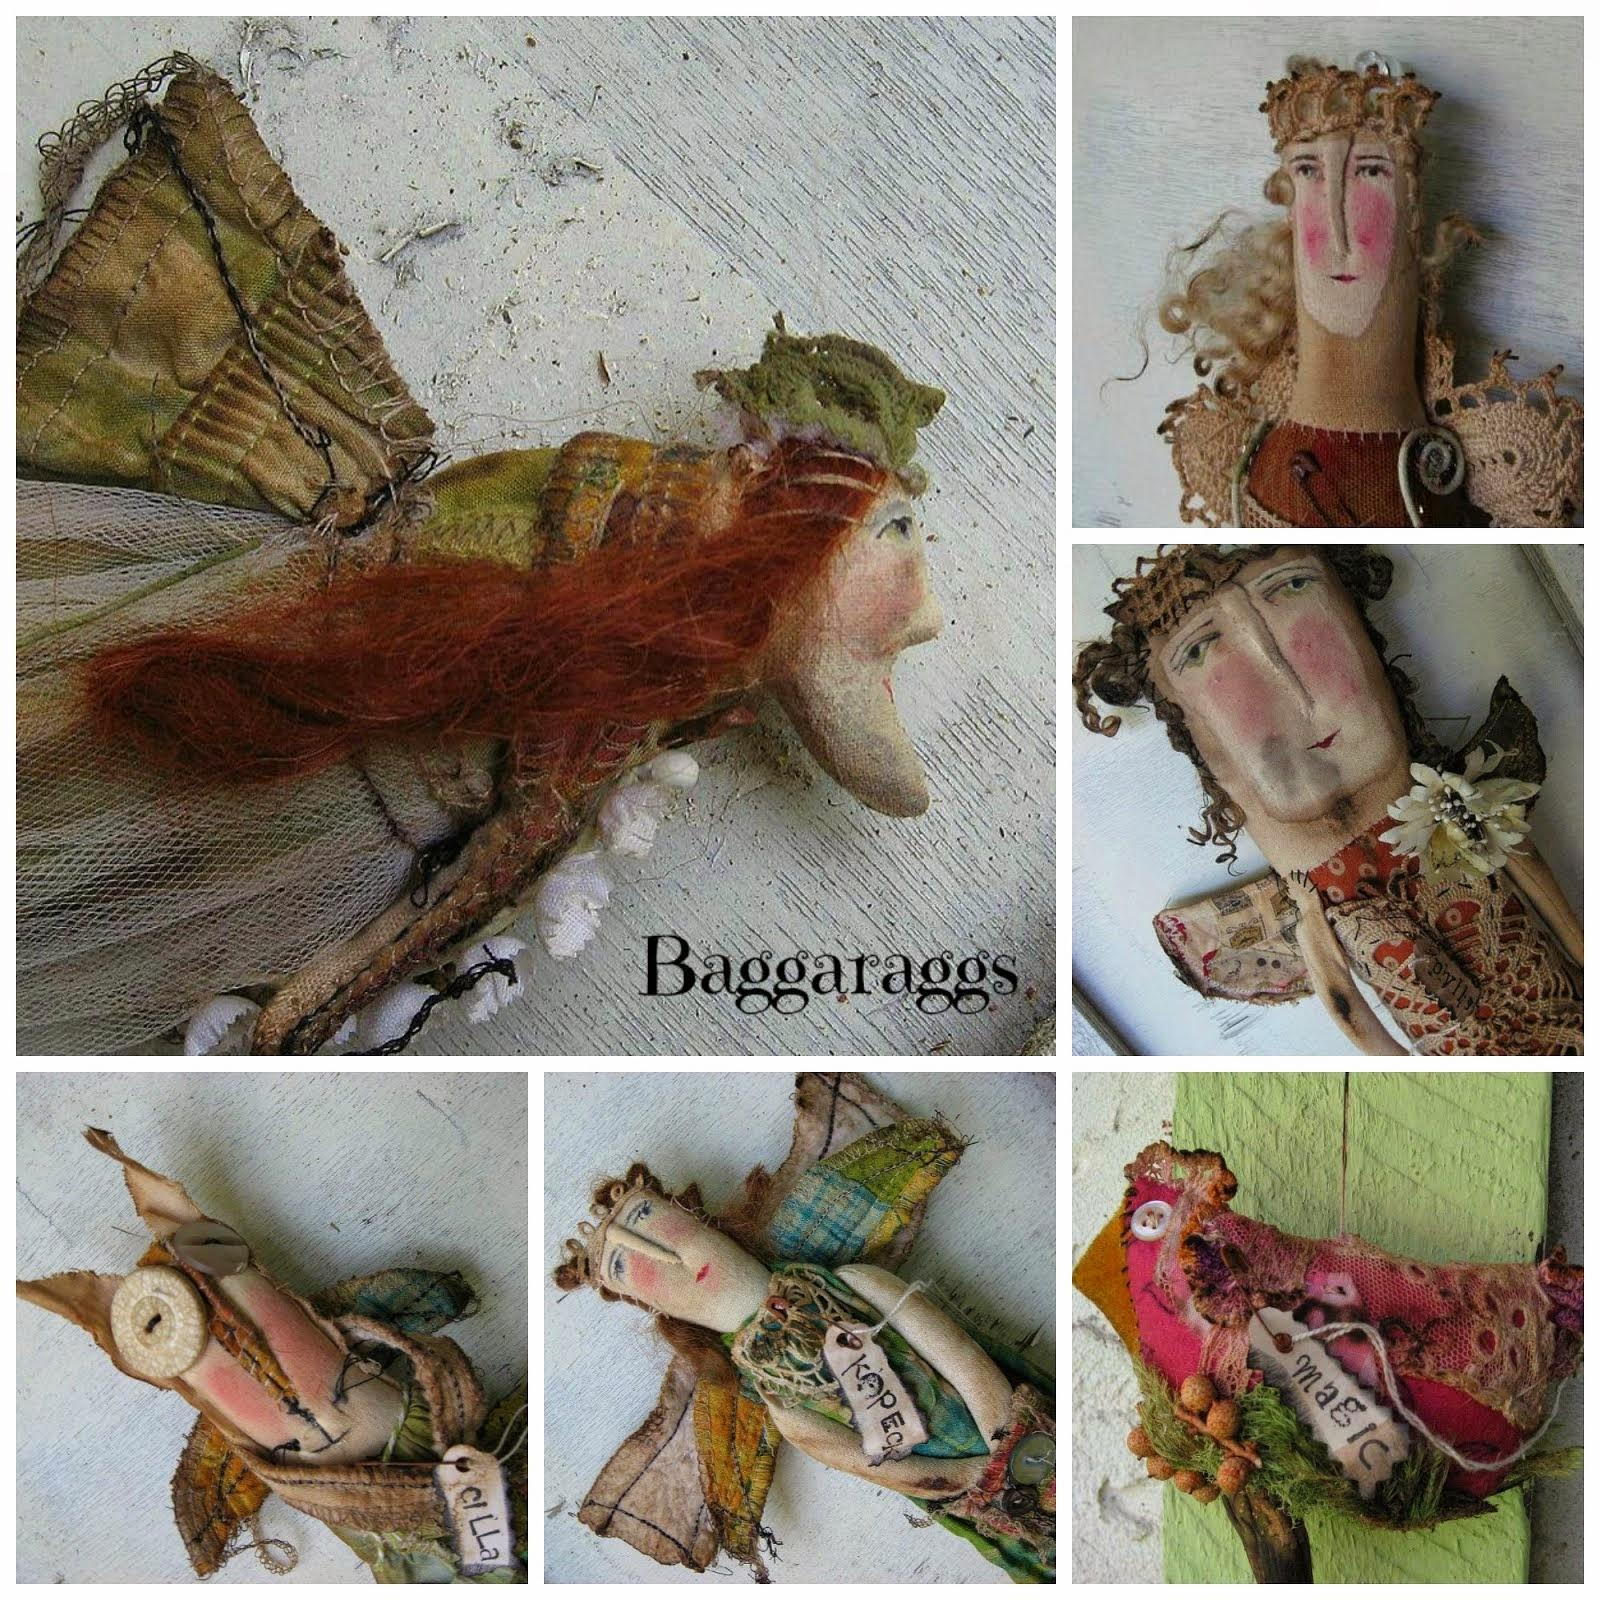 BaggaRaggs Blog link